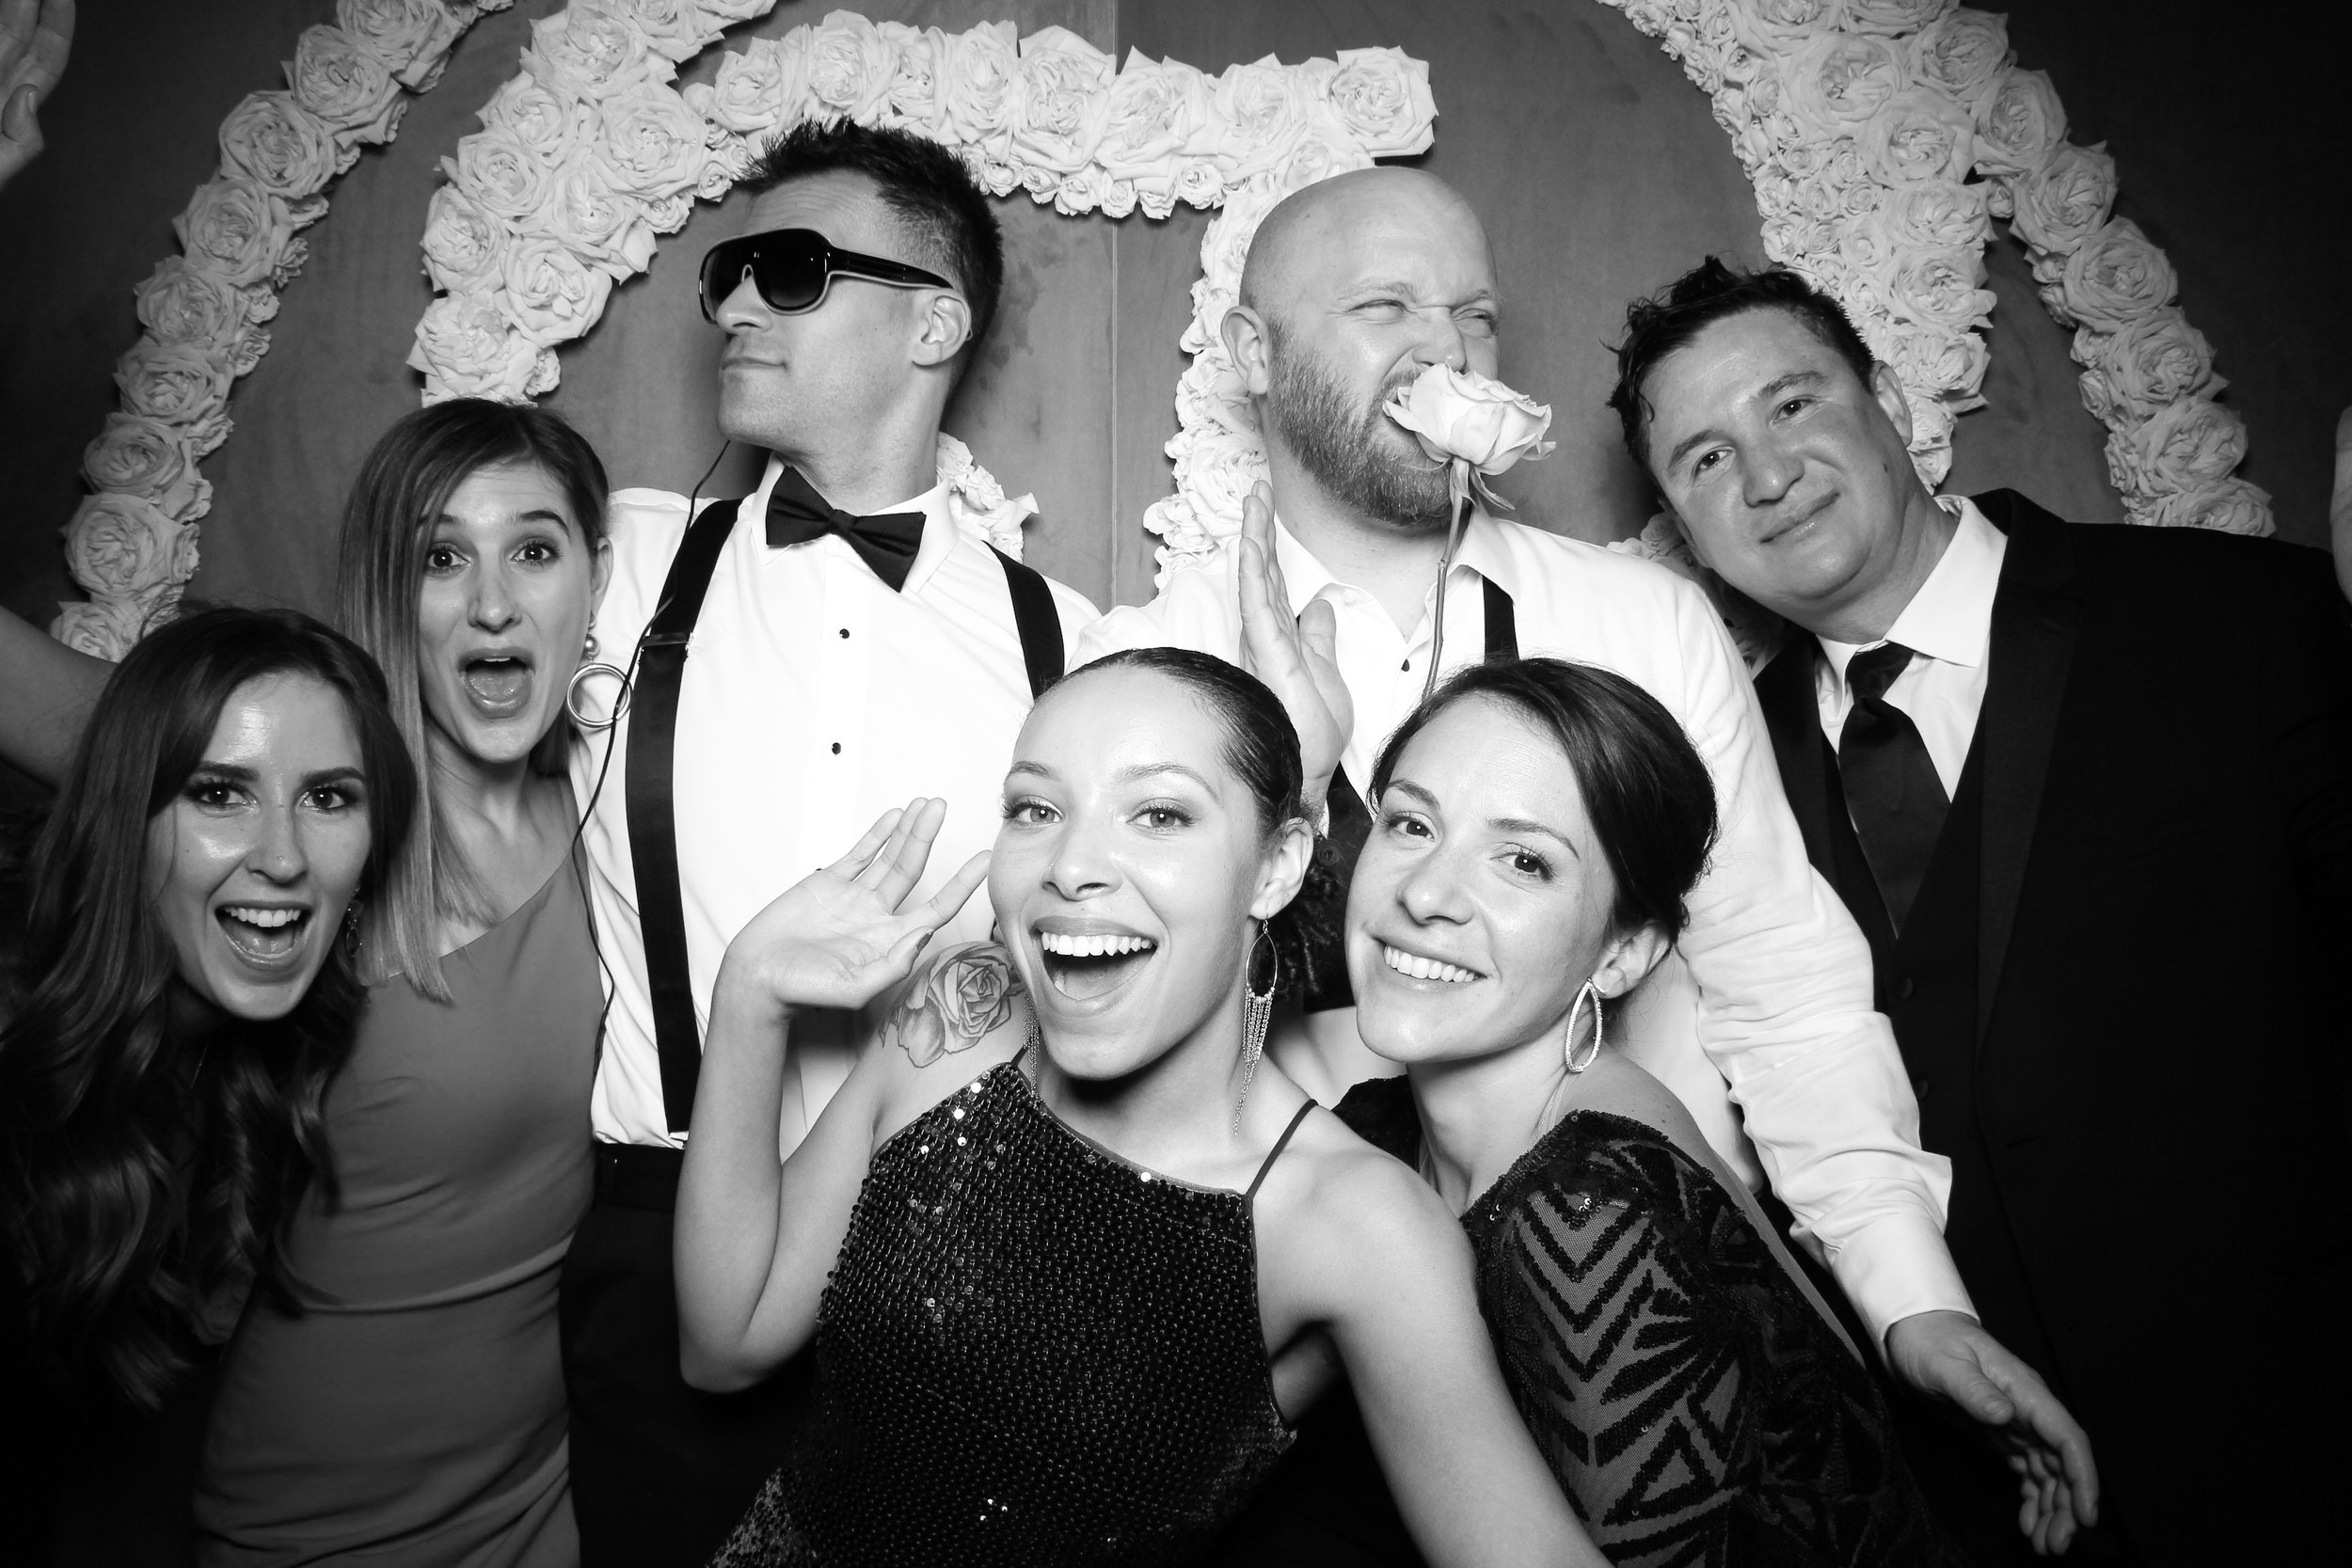 Photo_Booth_Rental_At_Standard_Club_Wedding_Chicago_03.jpg